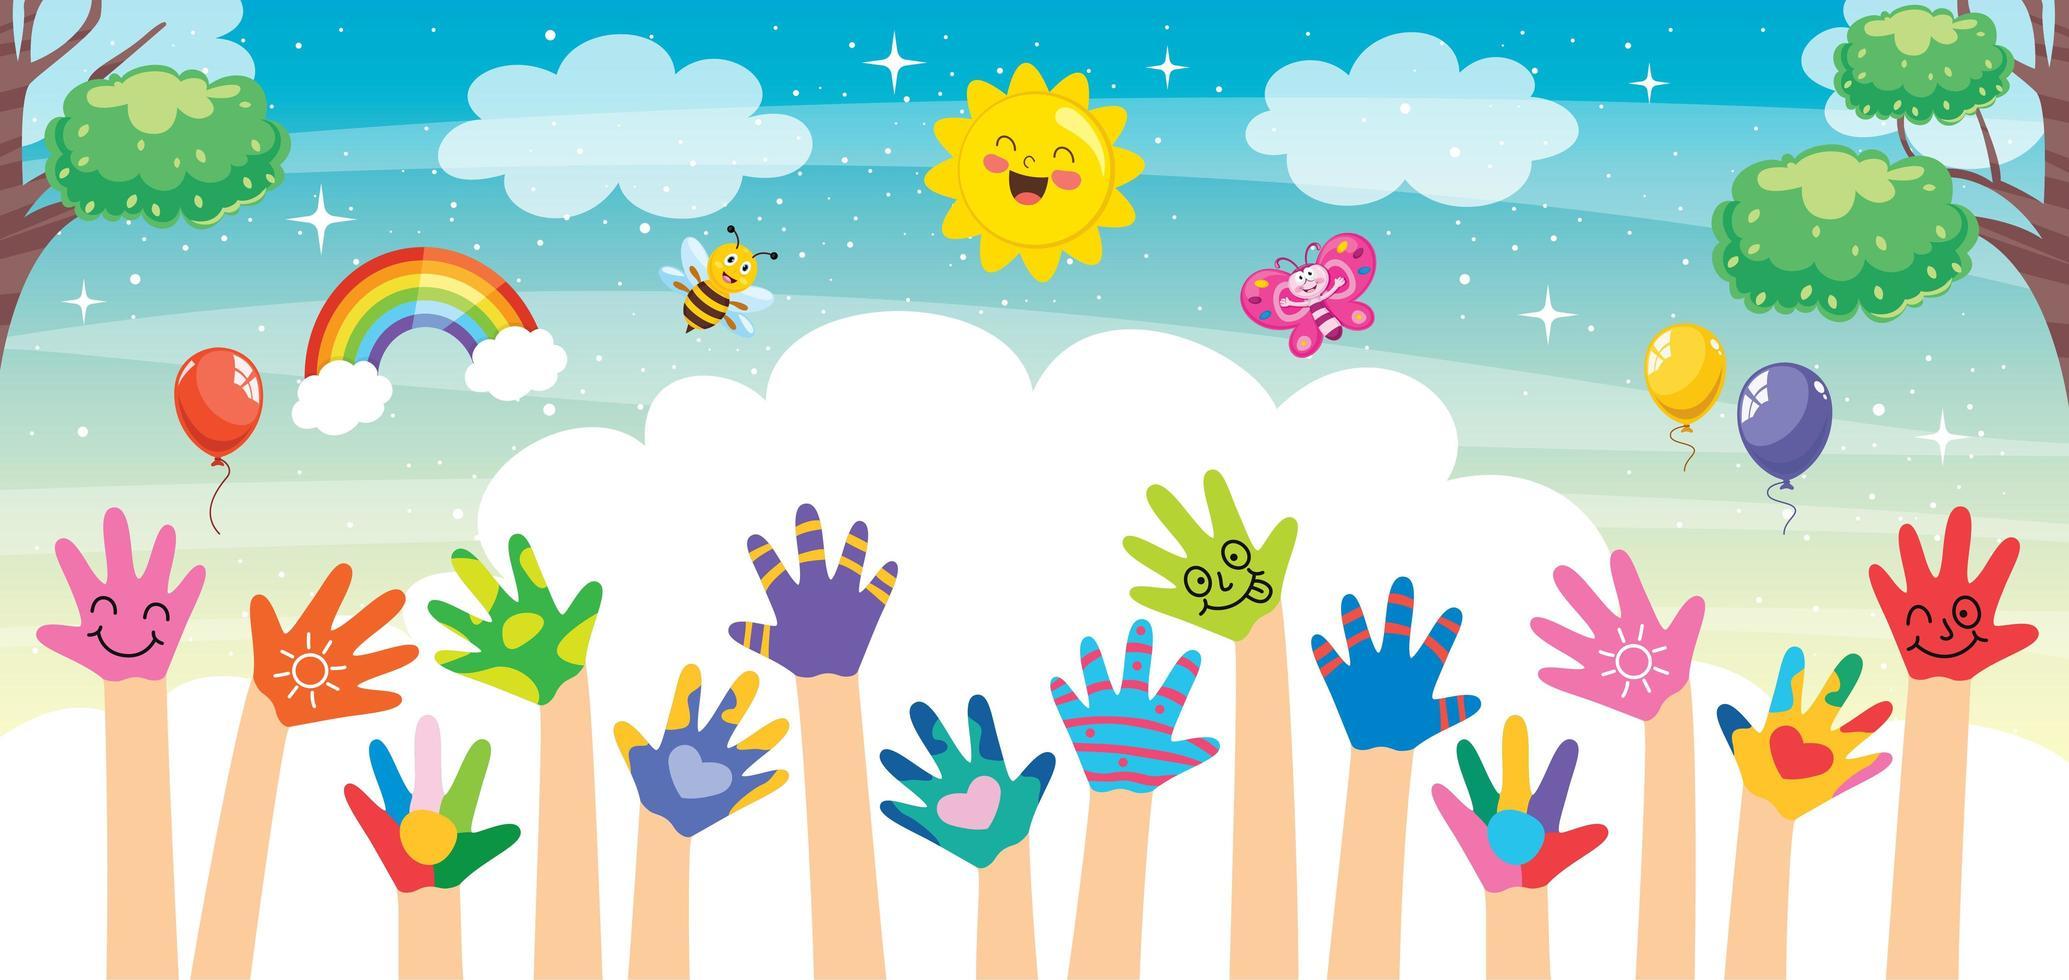 mains peintes de petits enfants vecteur